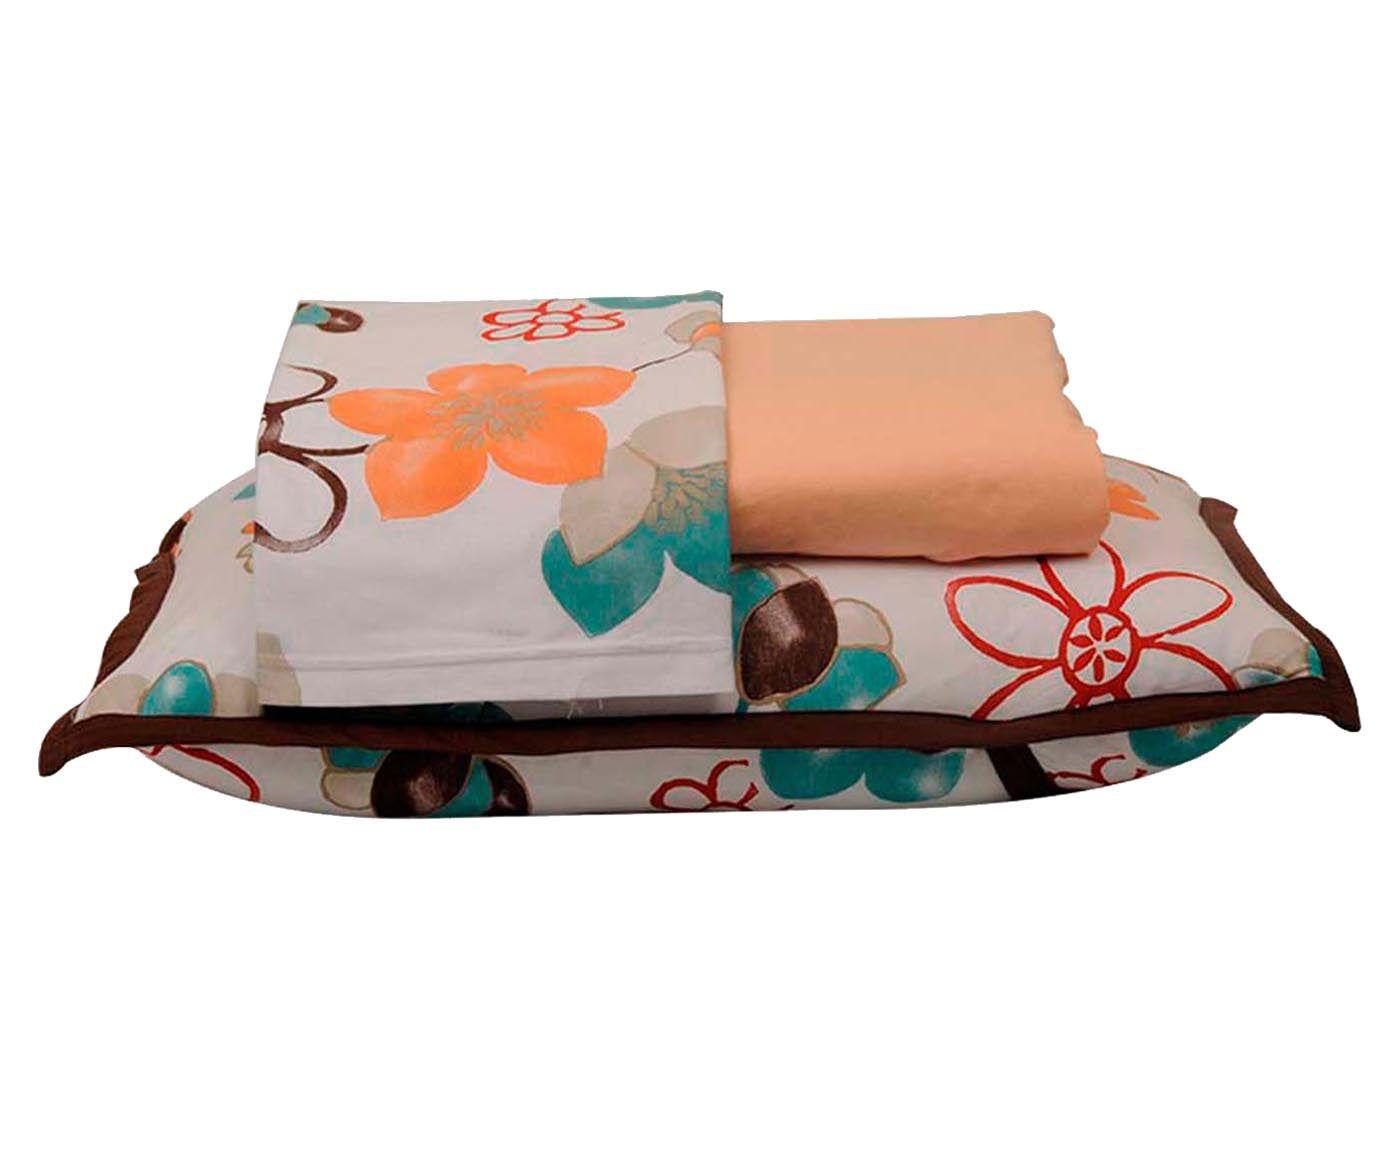 Jogo de lençol anne marie - para cama king size   Westwing.com.br